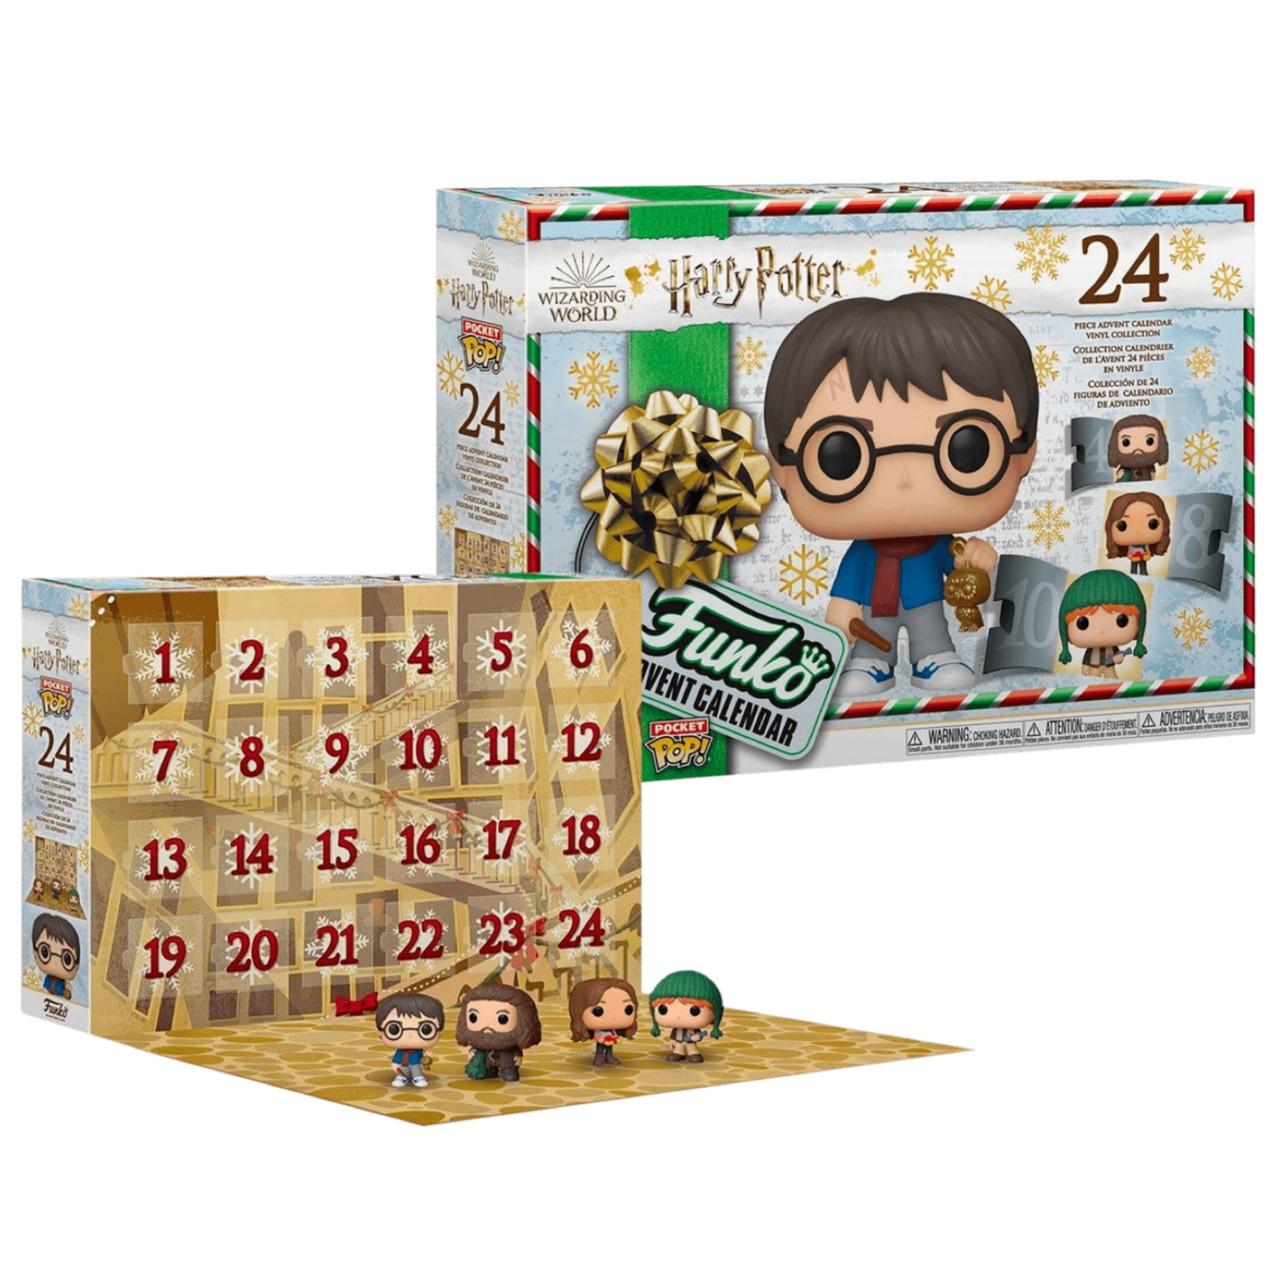 Funko адвент календарь Гарри Поттер